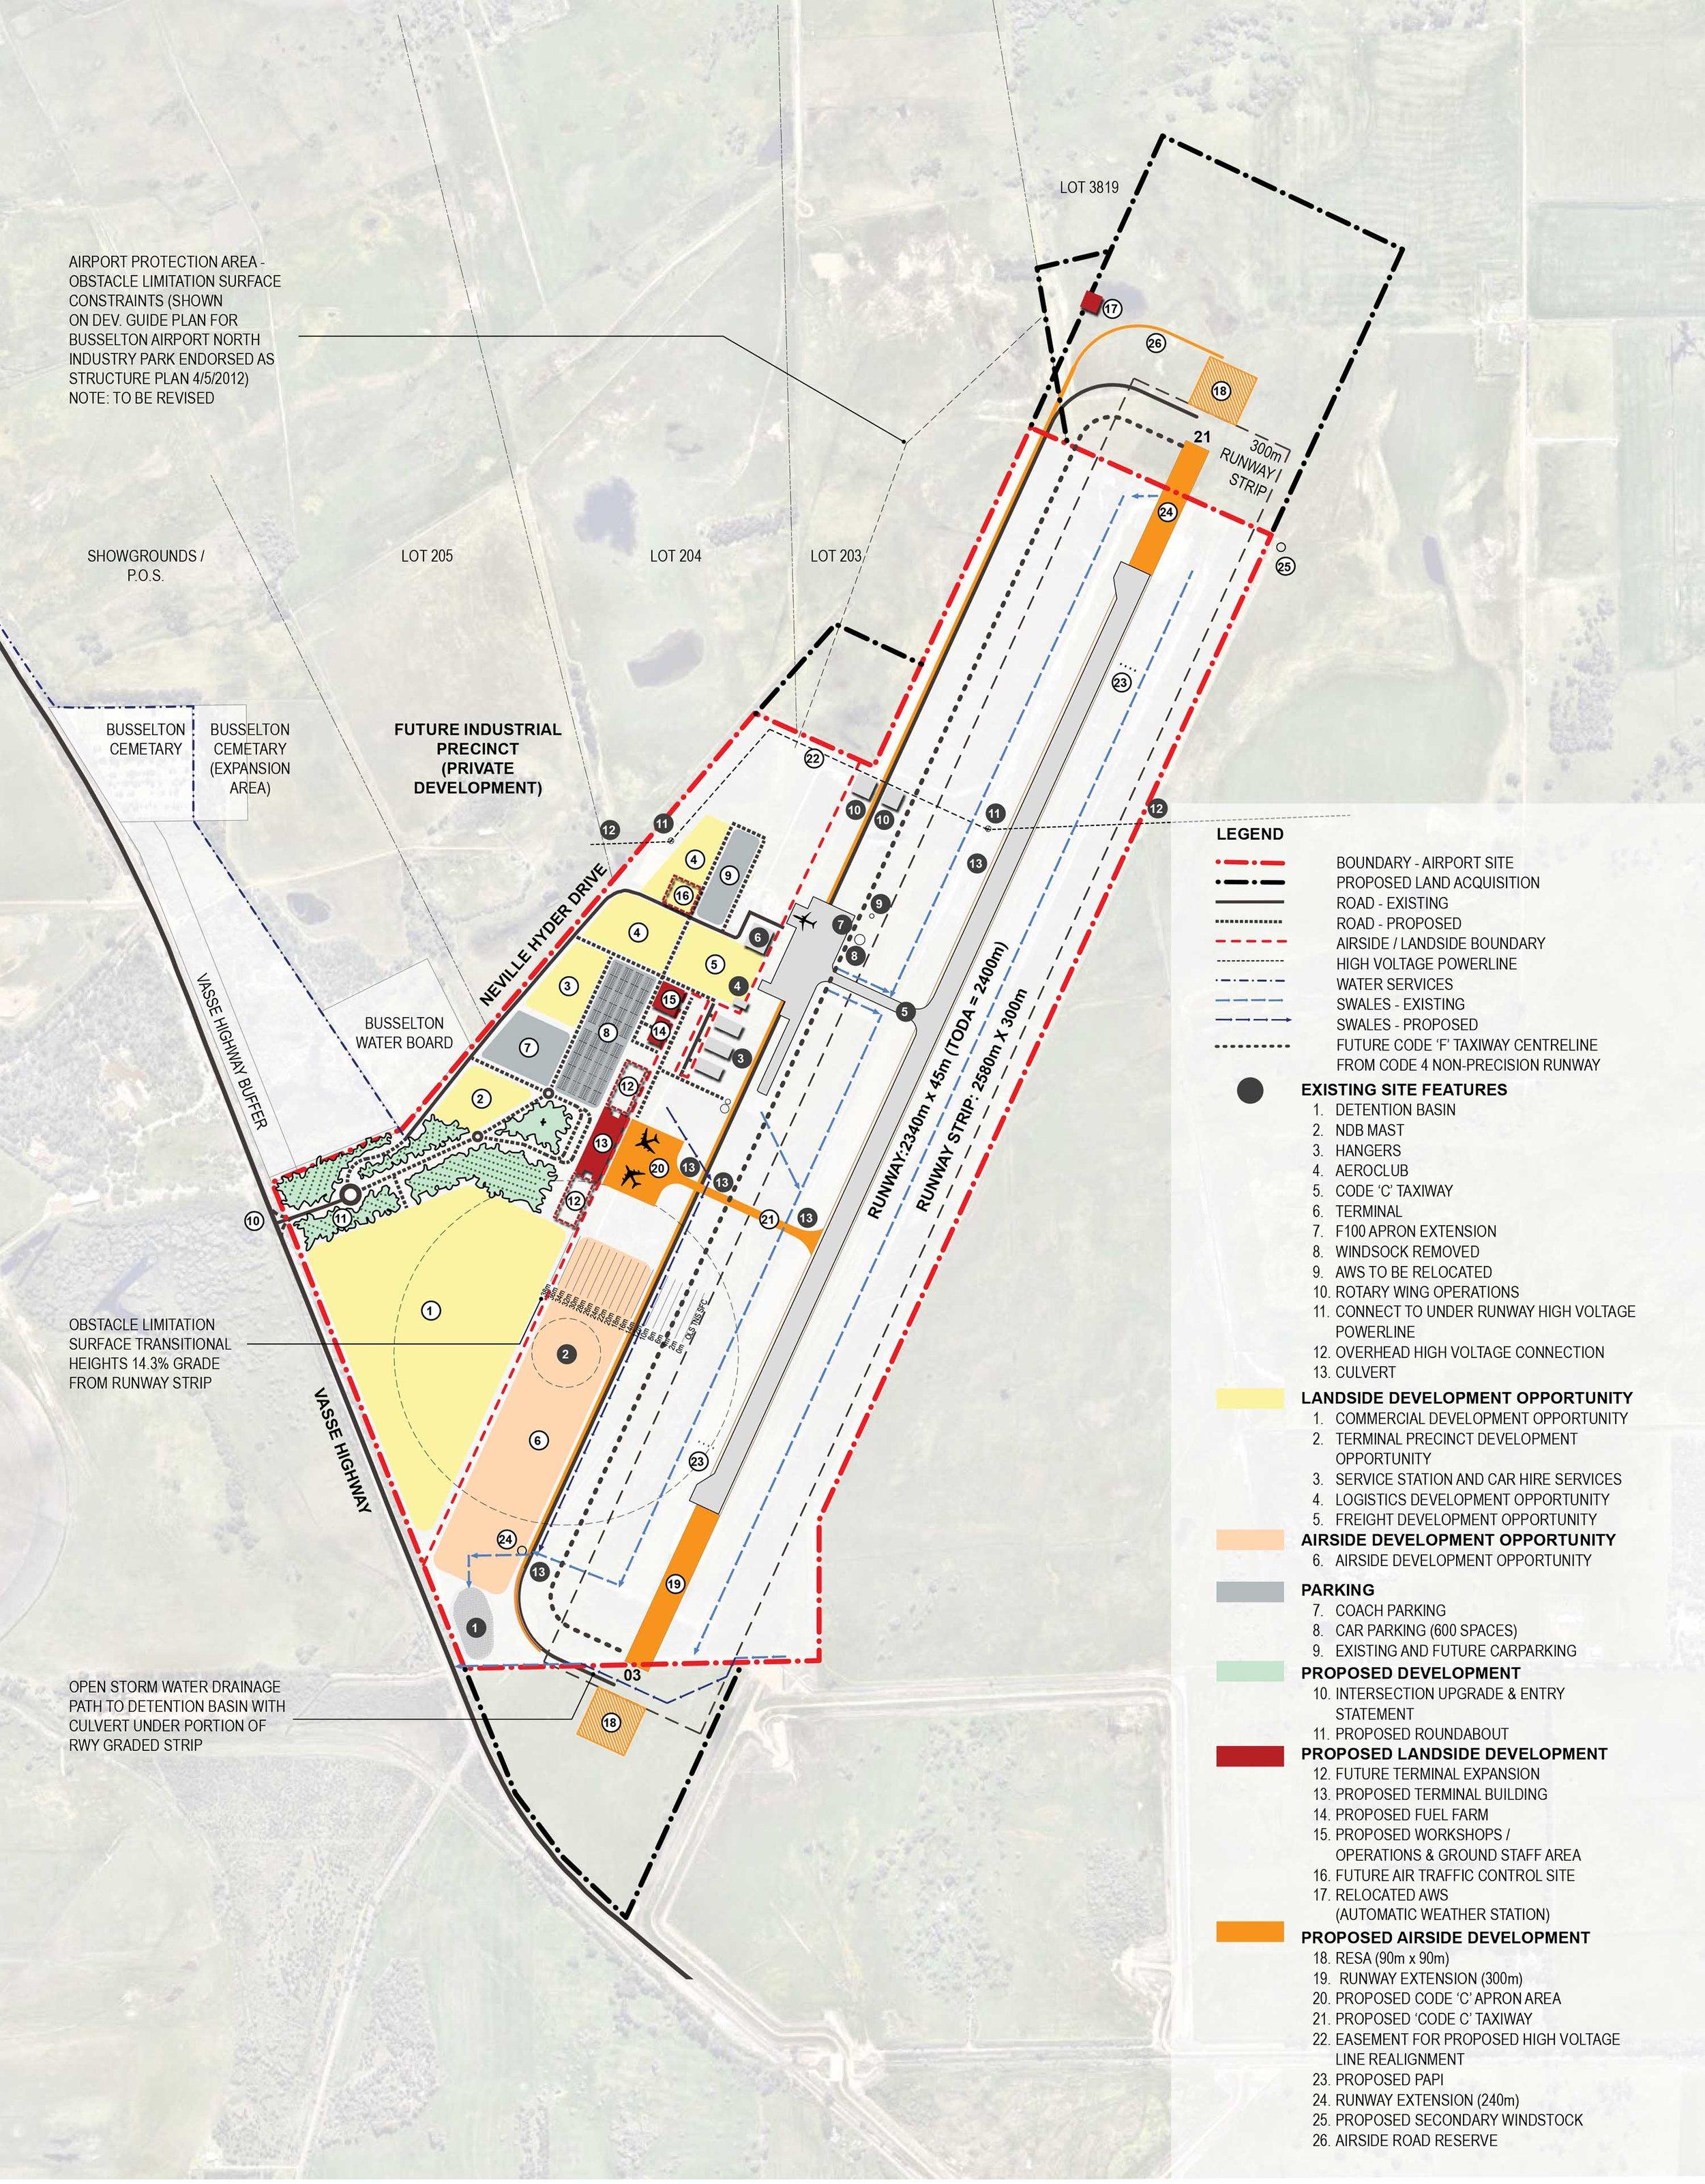 mode-design-busselton-airport-master-plan_01.jpg